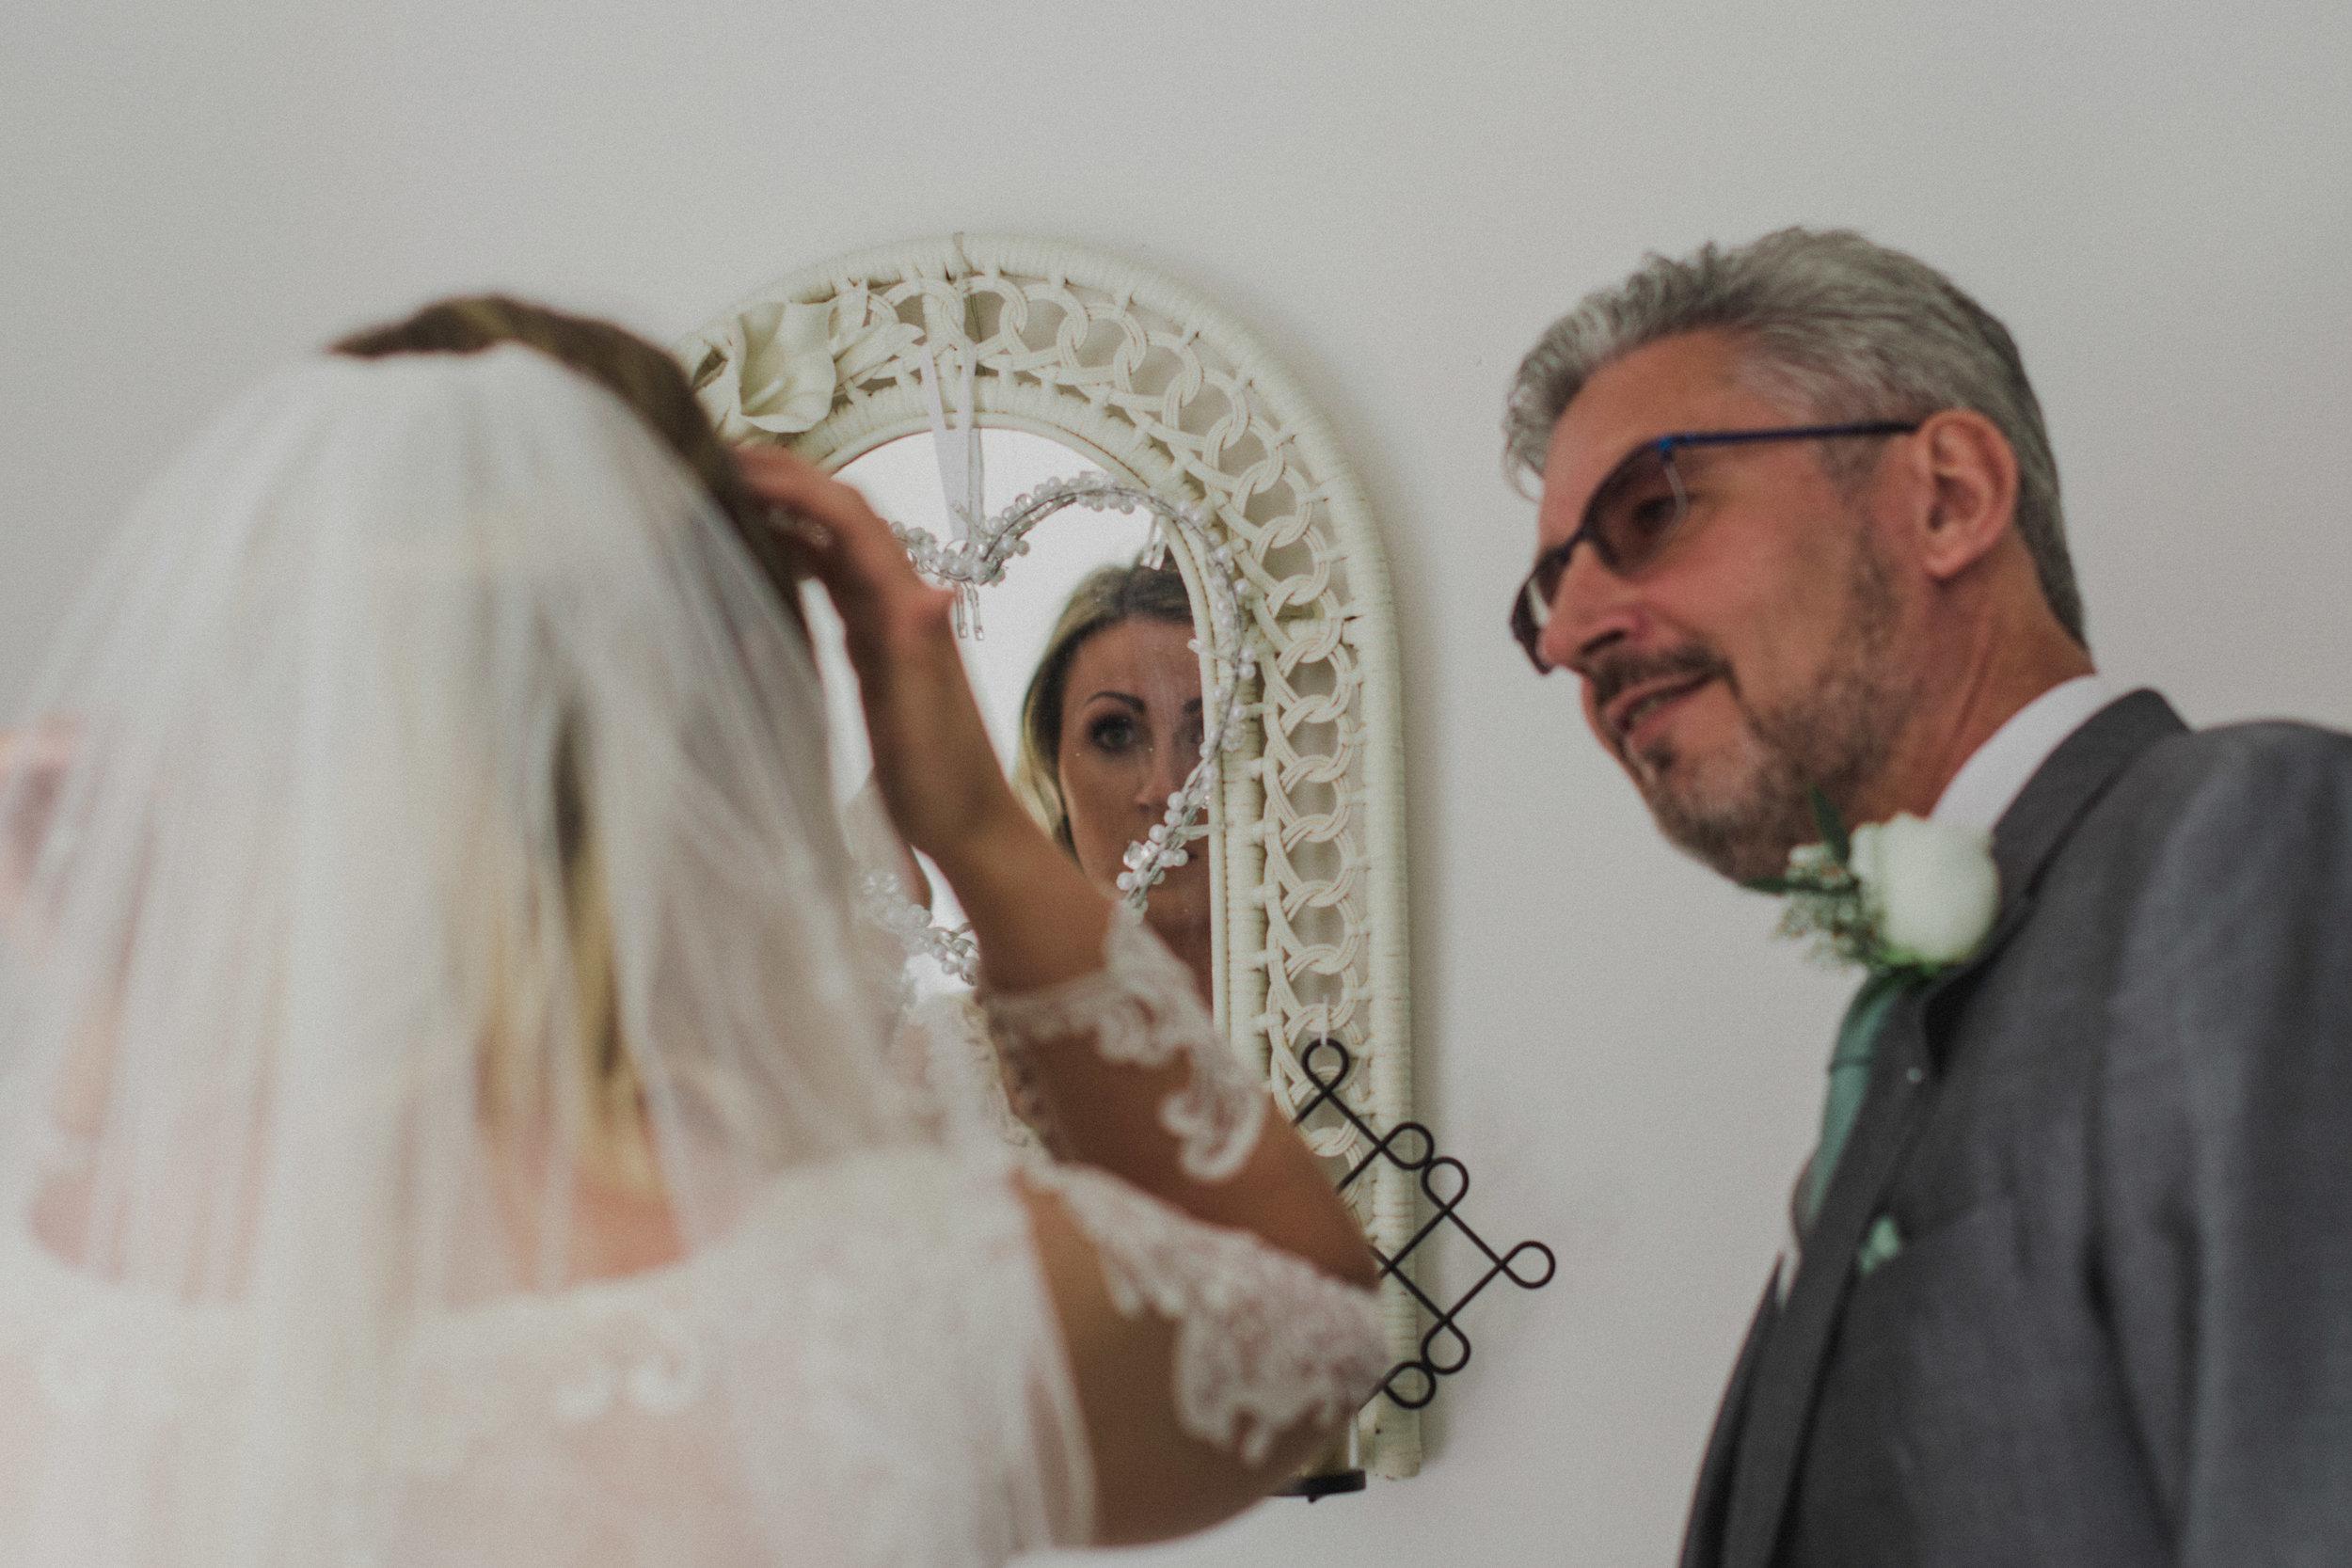 Cheshire wedding Photographer wedding photographer engagement photographer devon wedding photographer Shropshire wedding photographer  (1 of 1)-9.jpg